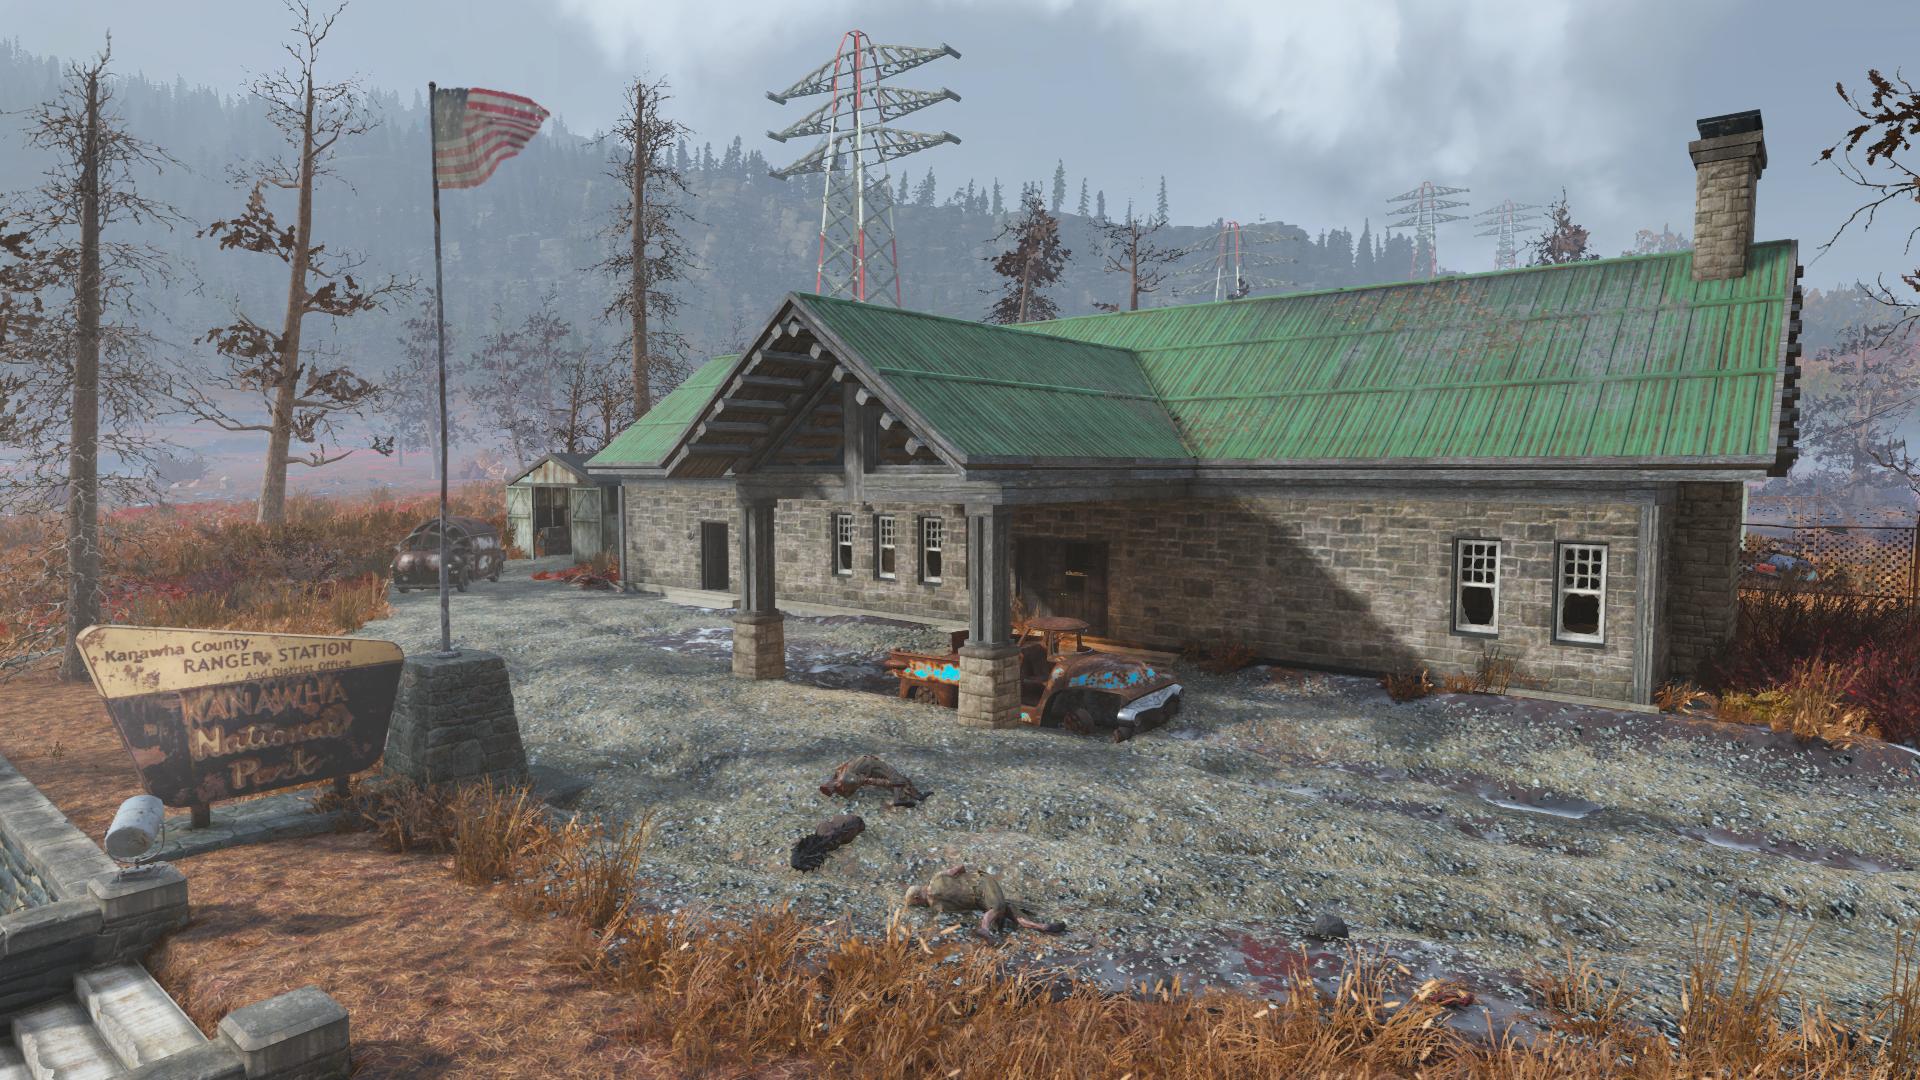 Ranger district office